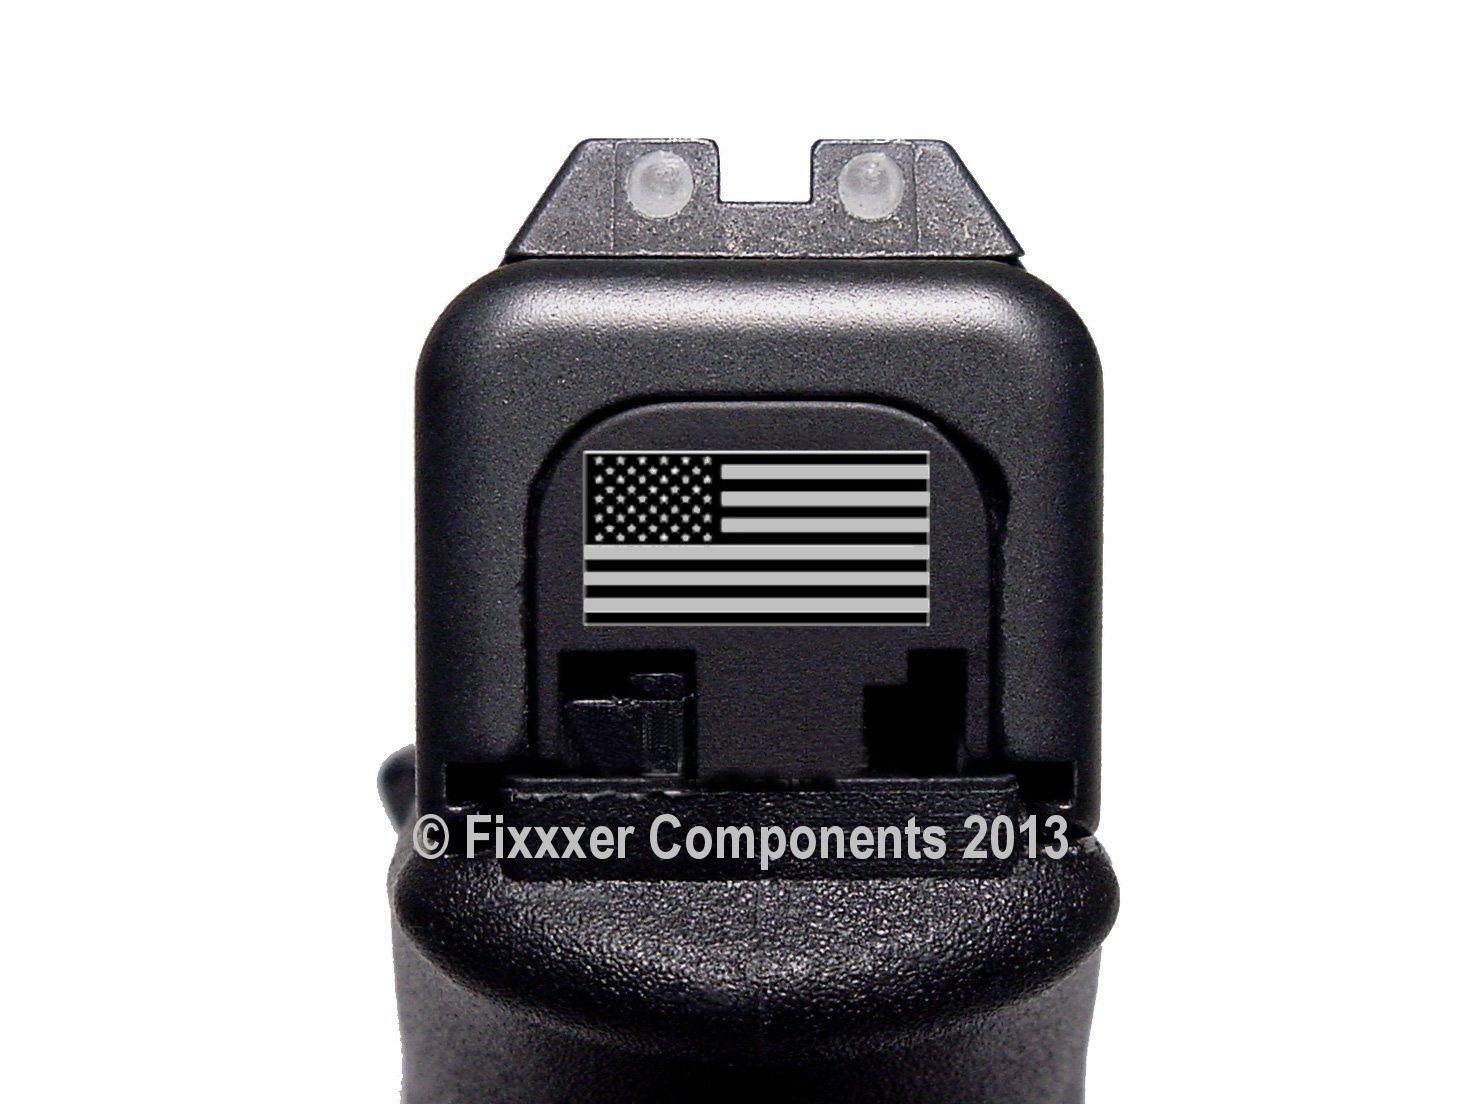 Fixxxer American Flag Slide Cover Plate for Glock